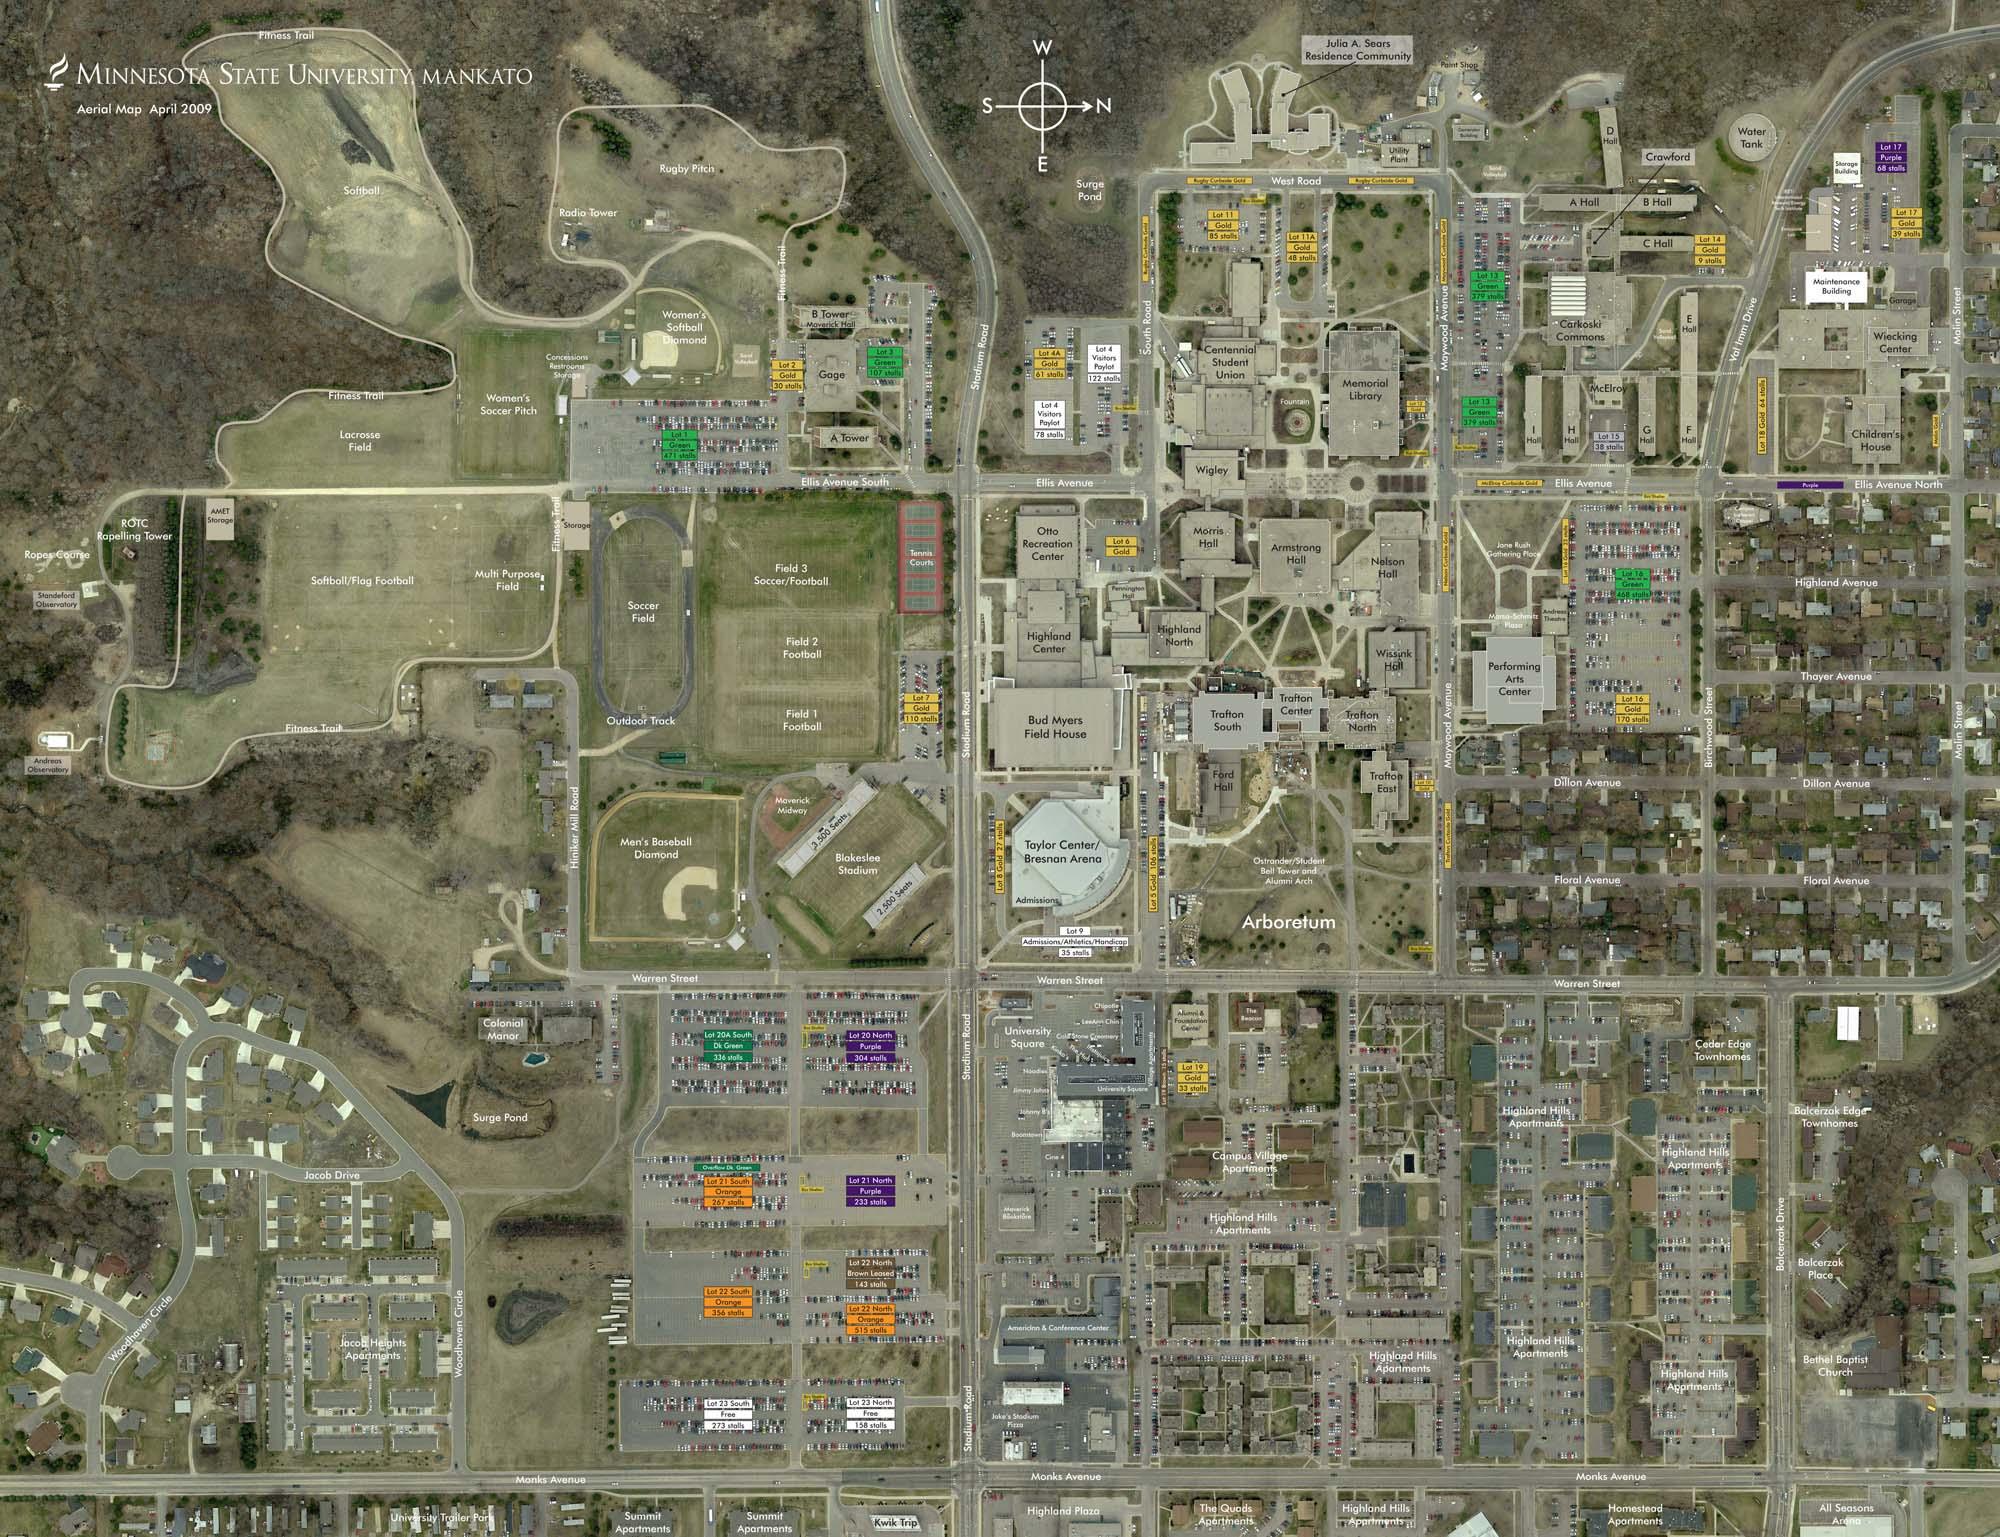 michigan state university wallpaper 2000x1537